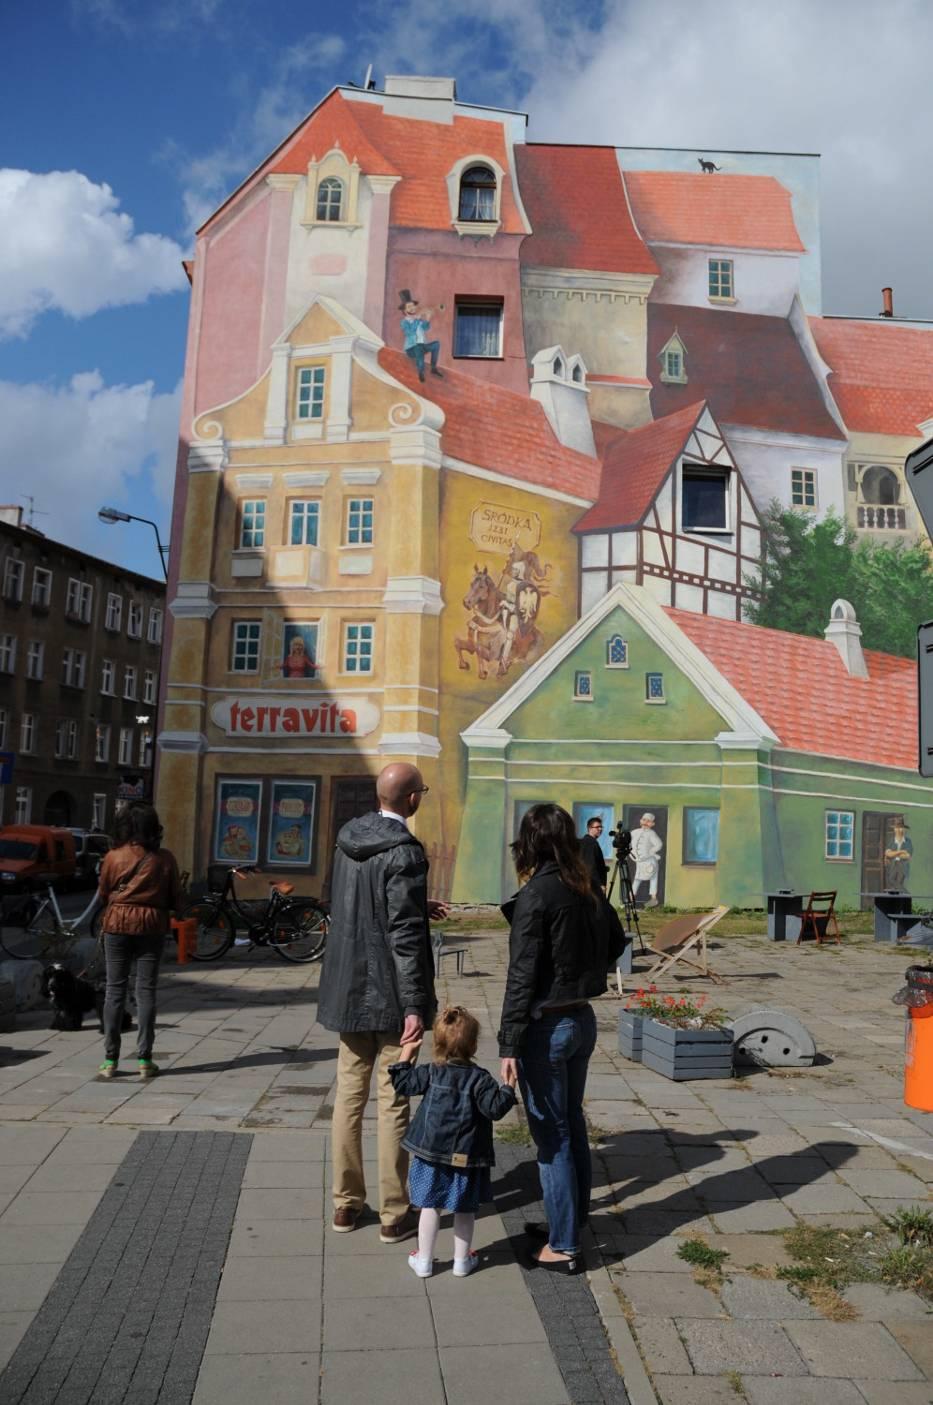 murale-citta-storia-gerard-cofta-srodka-poznan-polonia-6